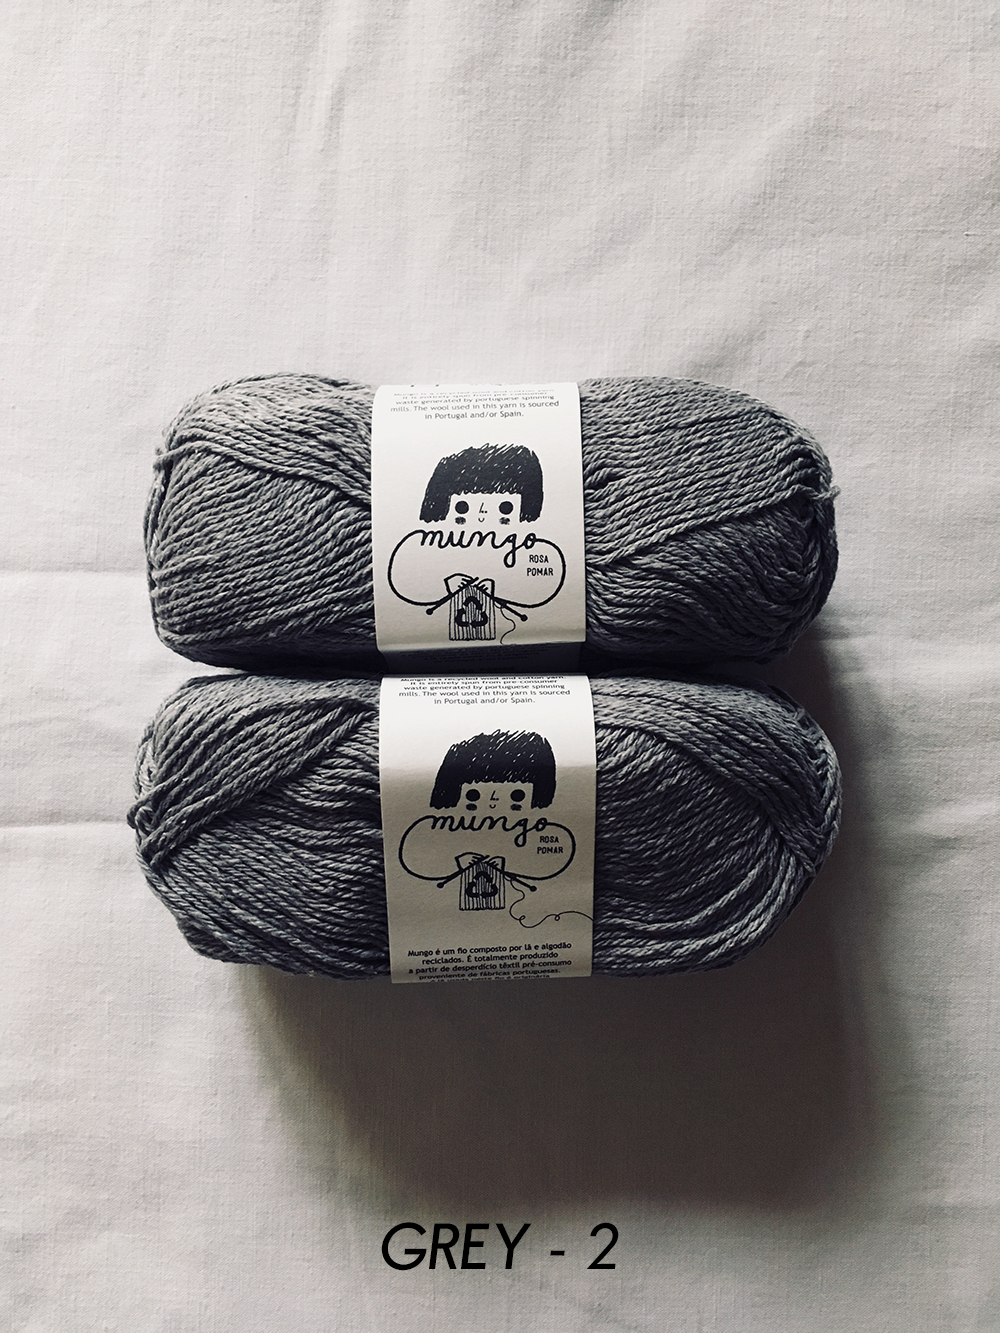 retrosaria_mungo_2_wool_done_knitting.jpg